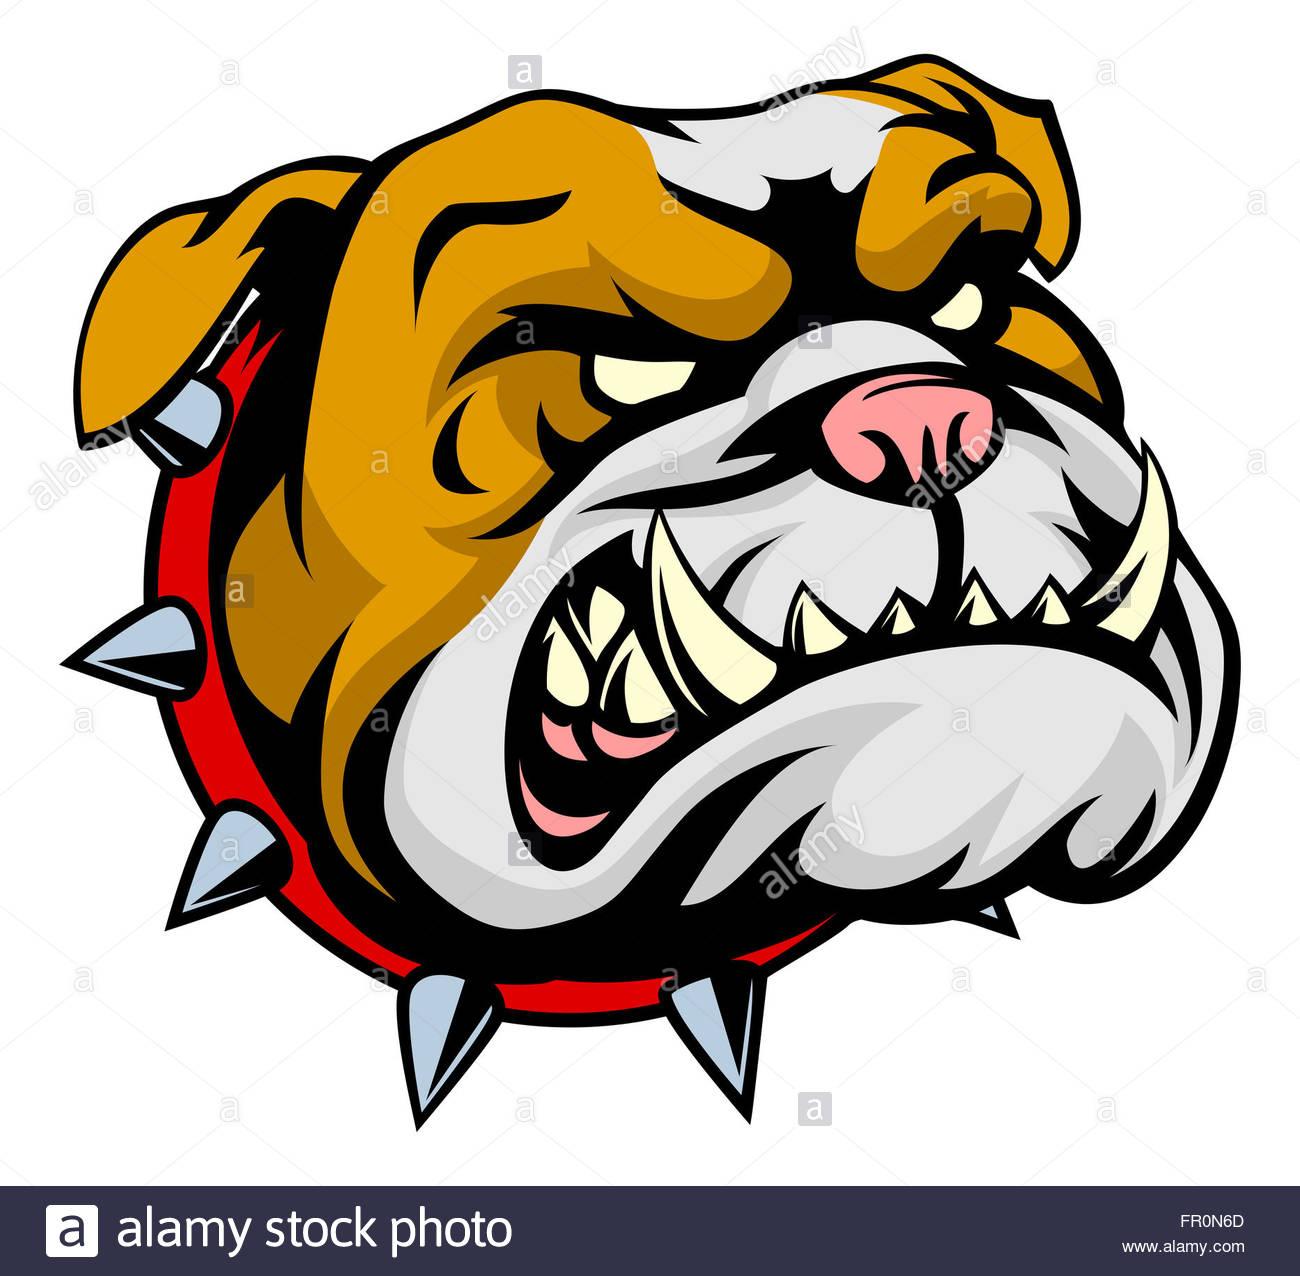 1300x1276 A Mean Looking Cartoon Bulldog Dog In A Spiked Collar Stock Photo